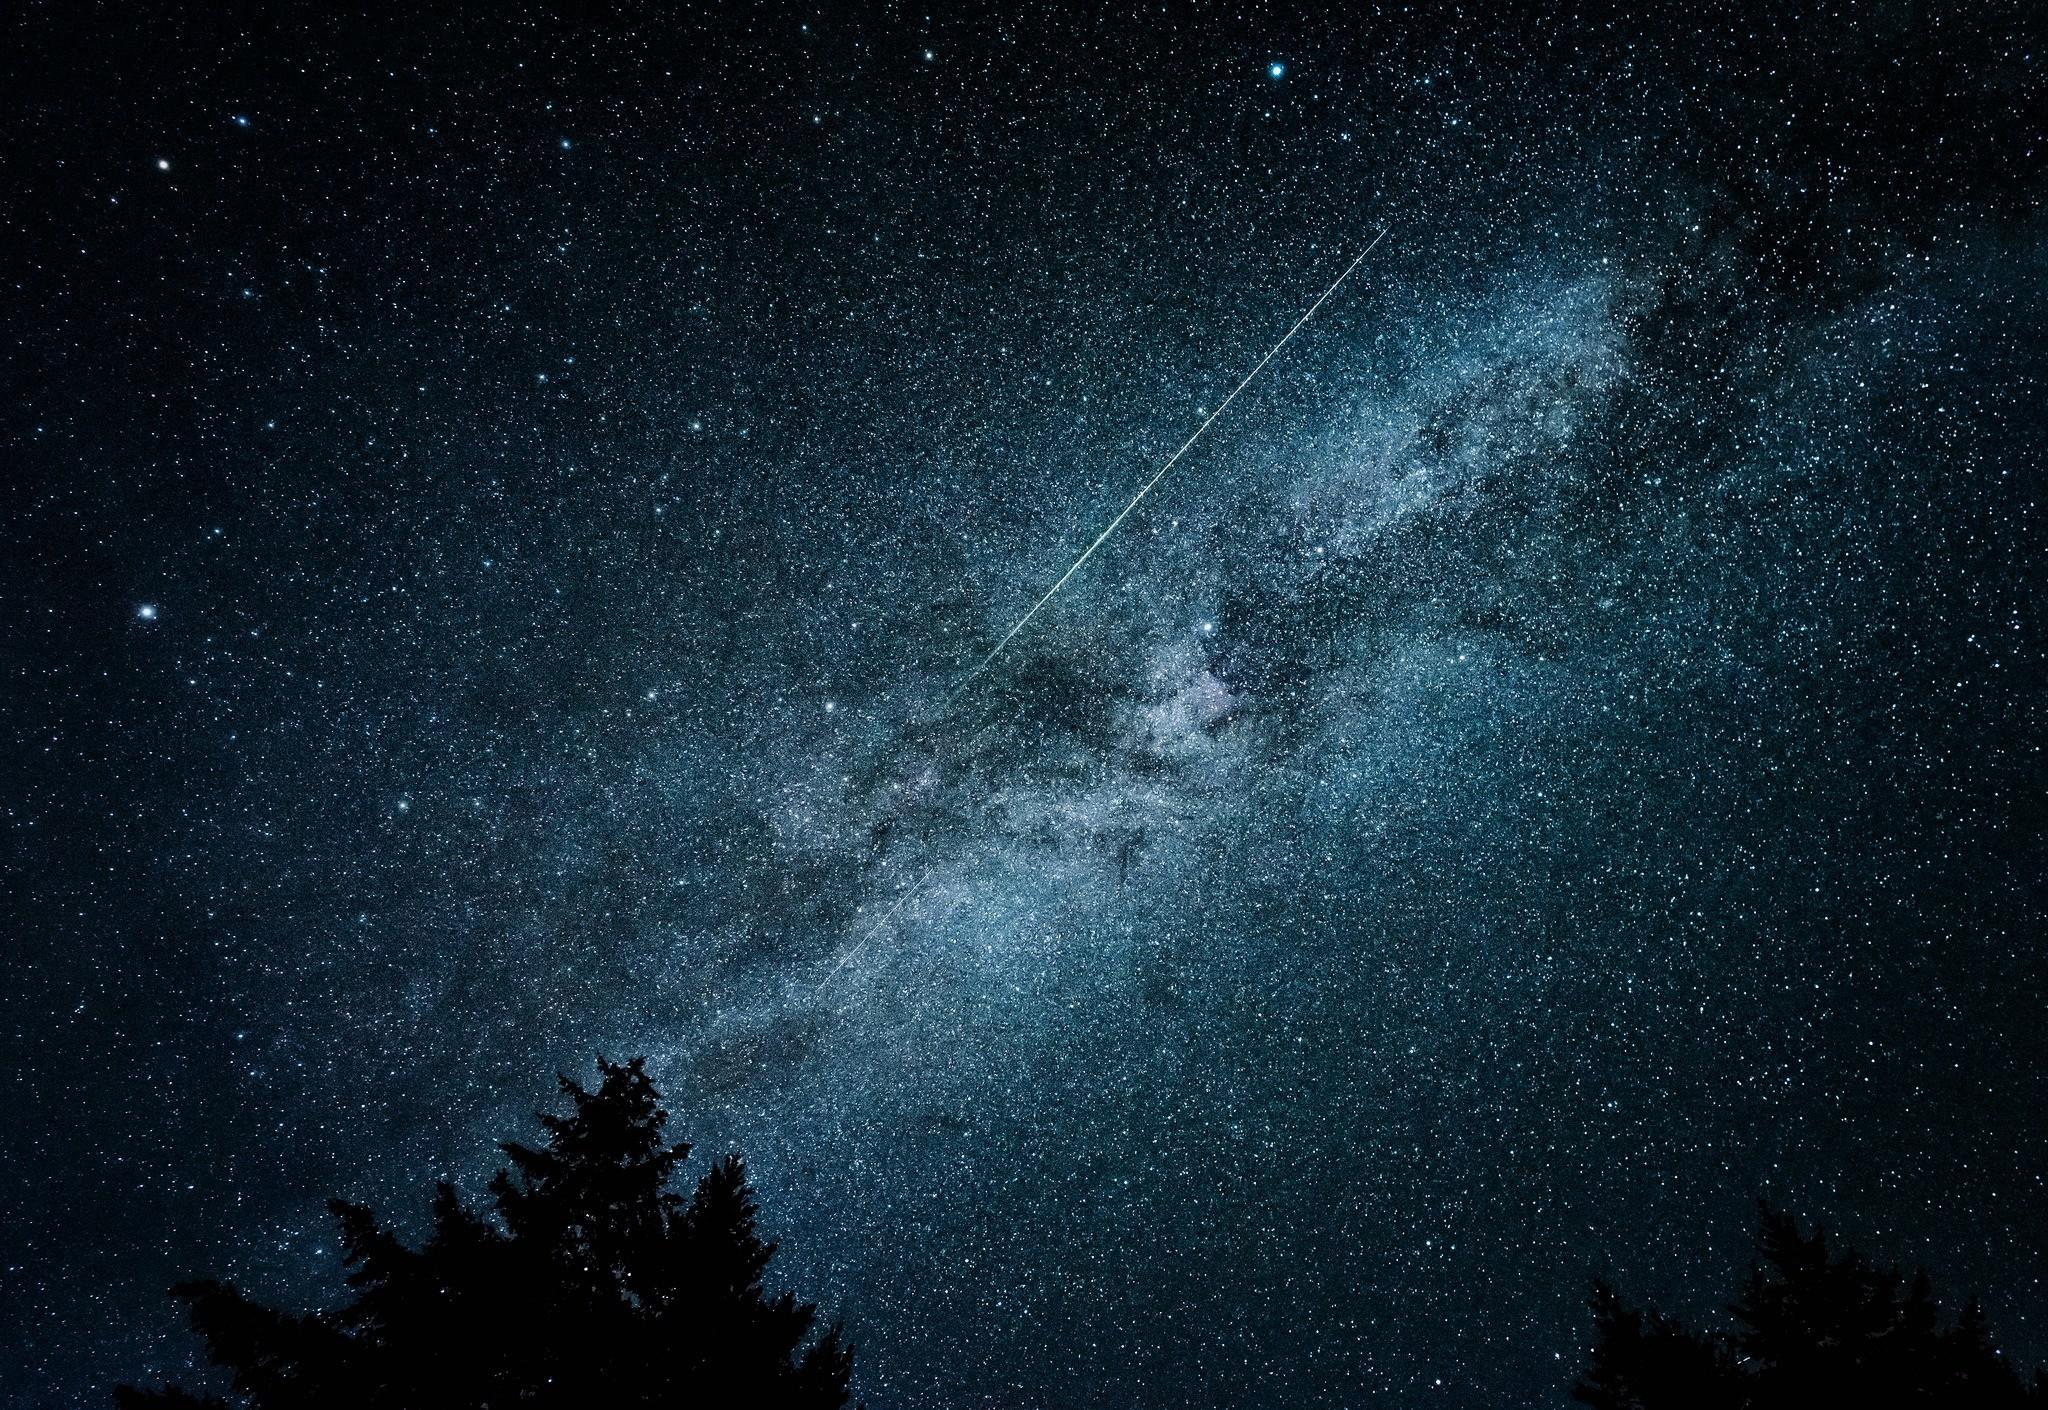 General 2048x1410 stars silhouette pine trees night comet